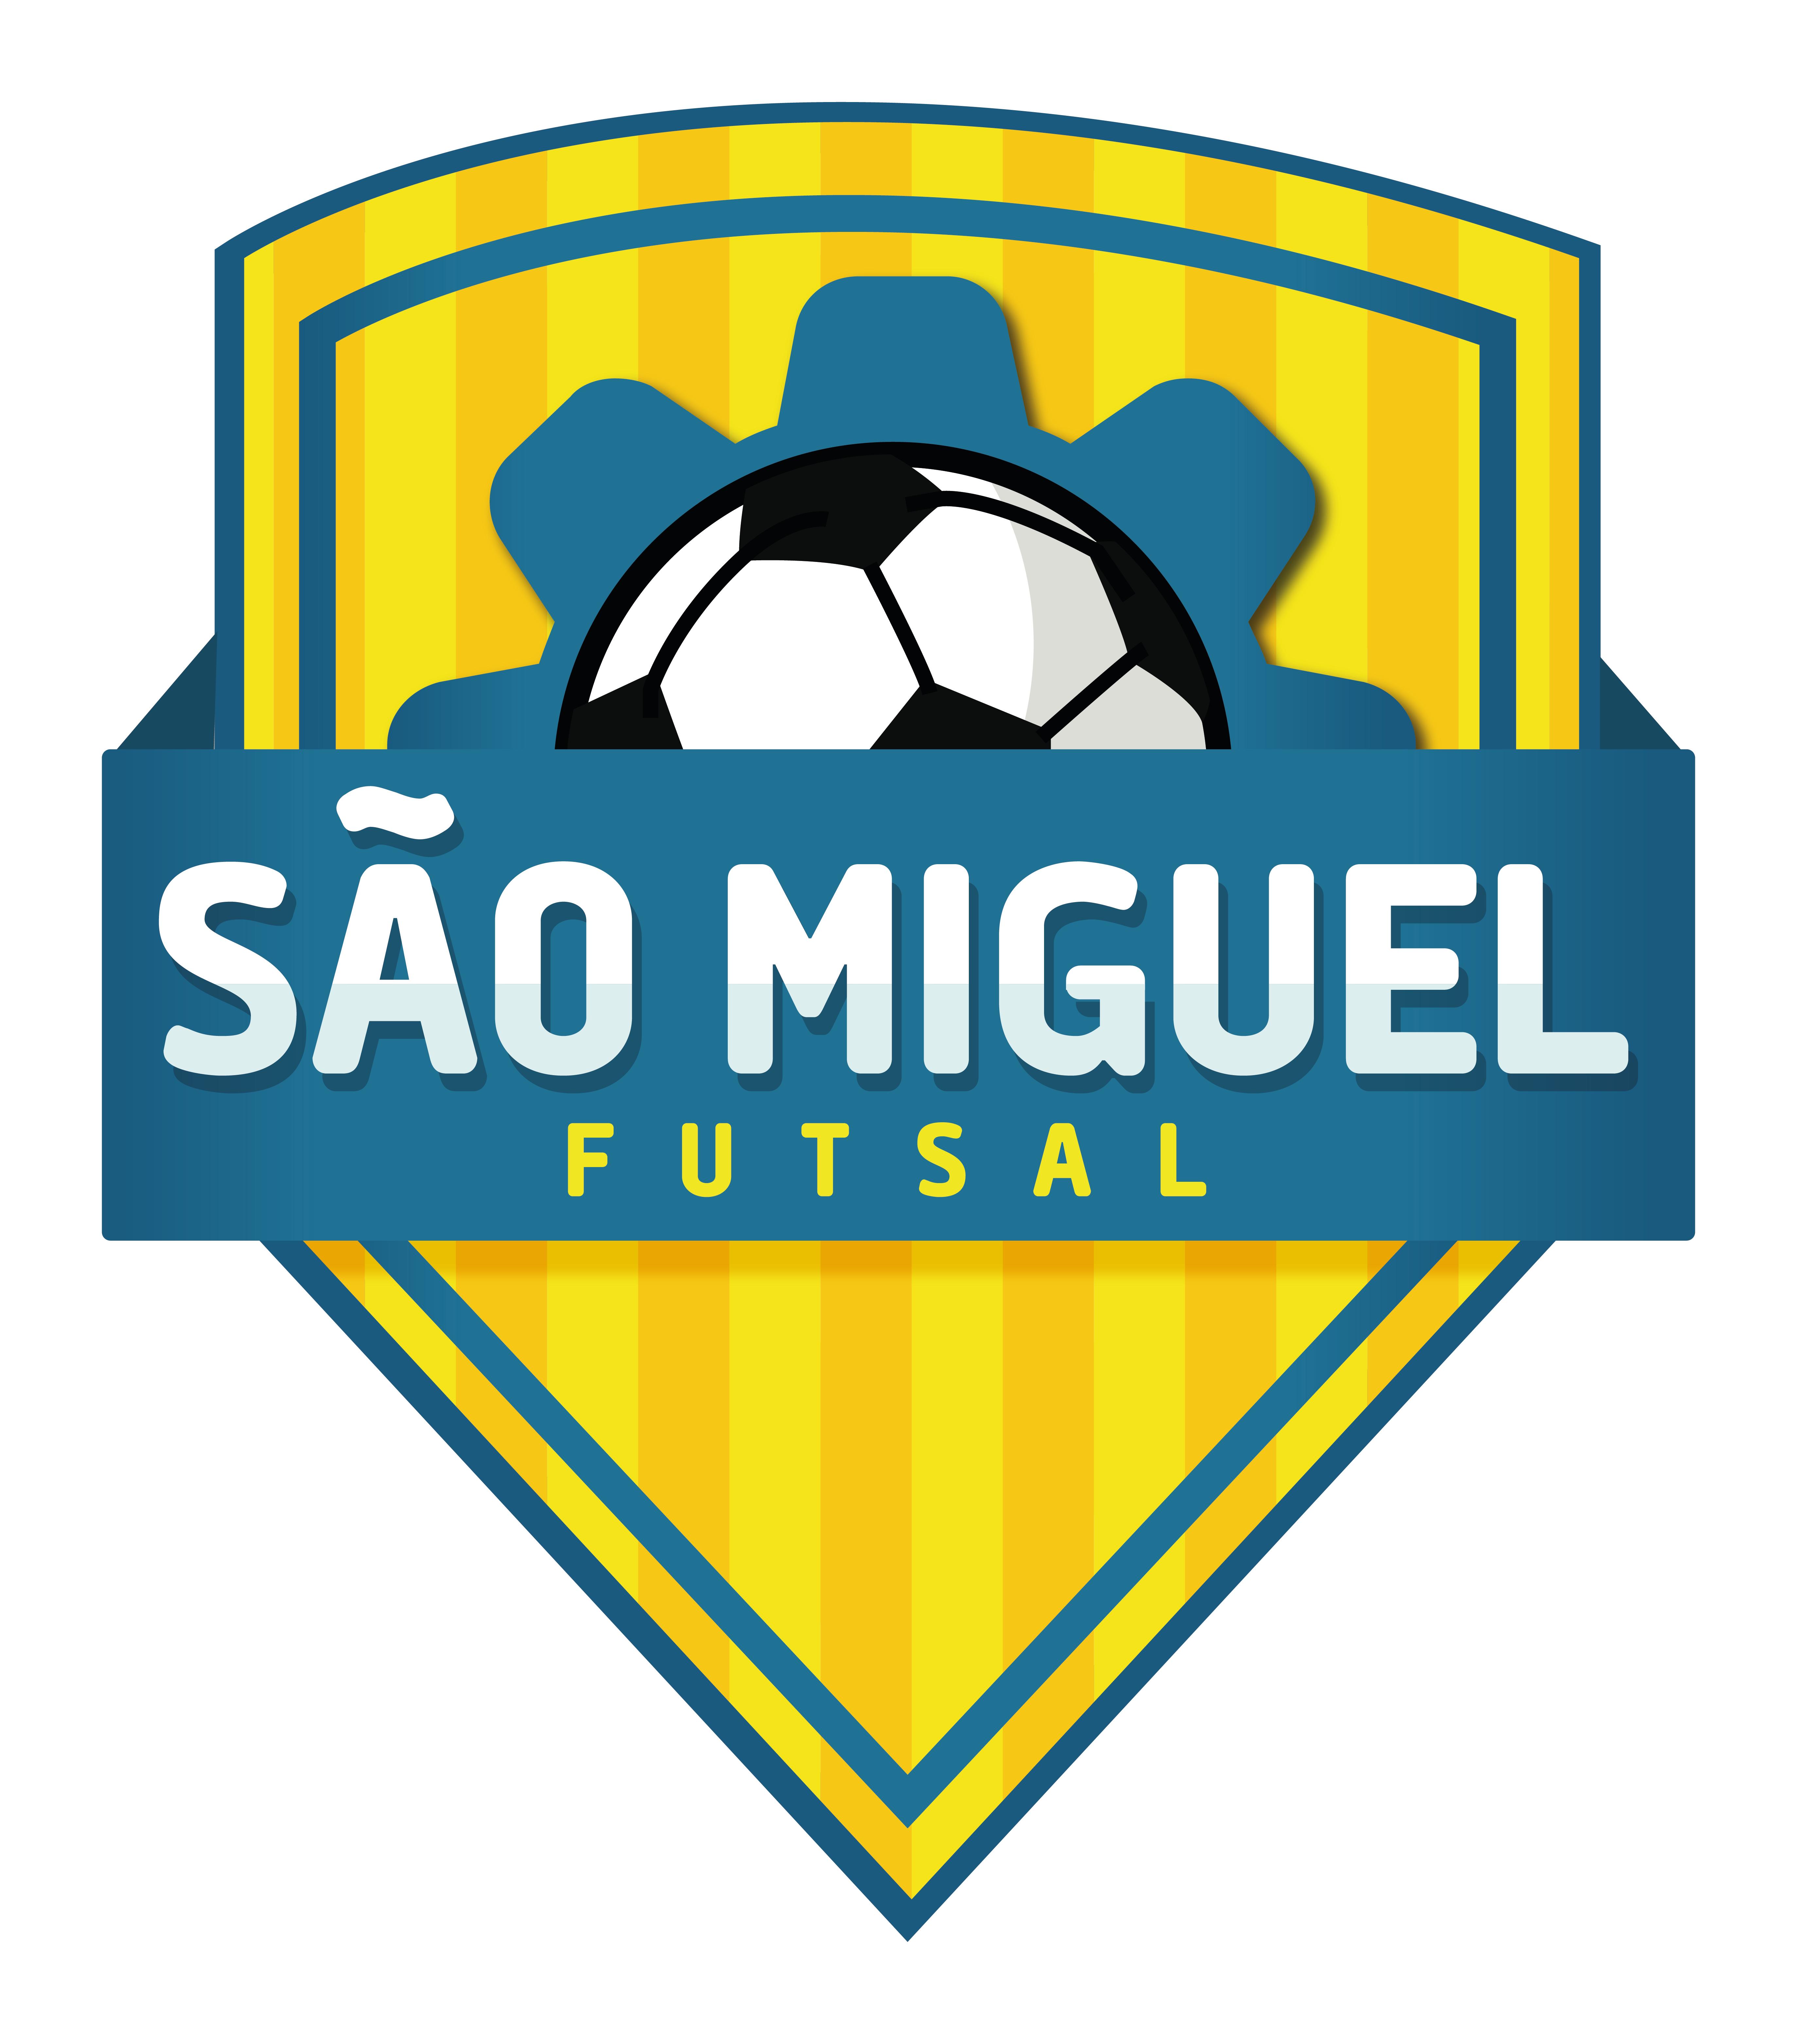 São Miguel Futsal